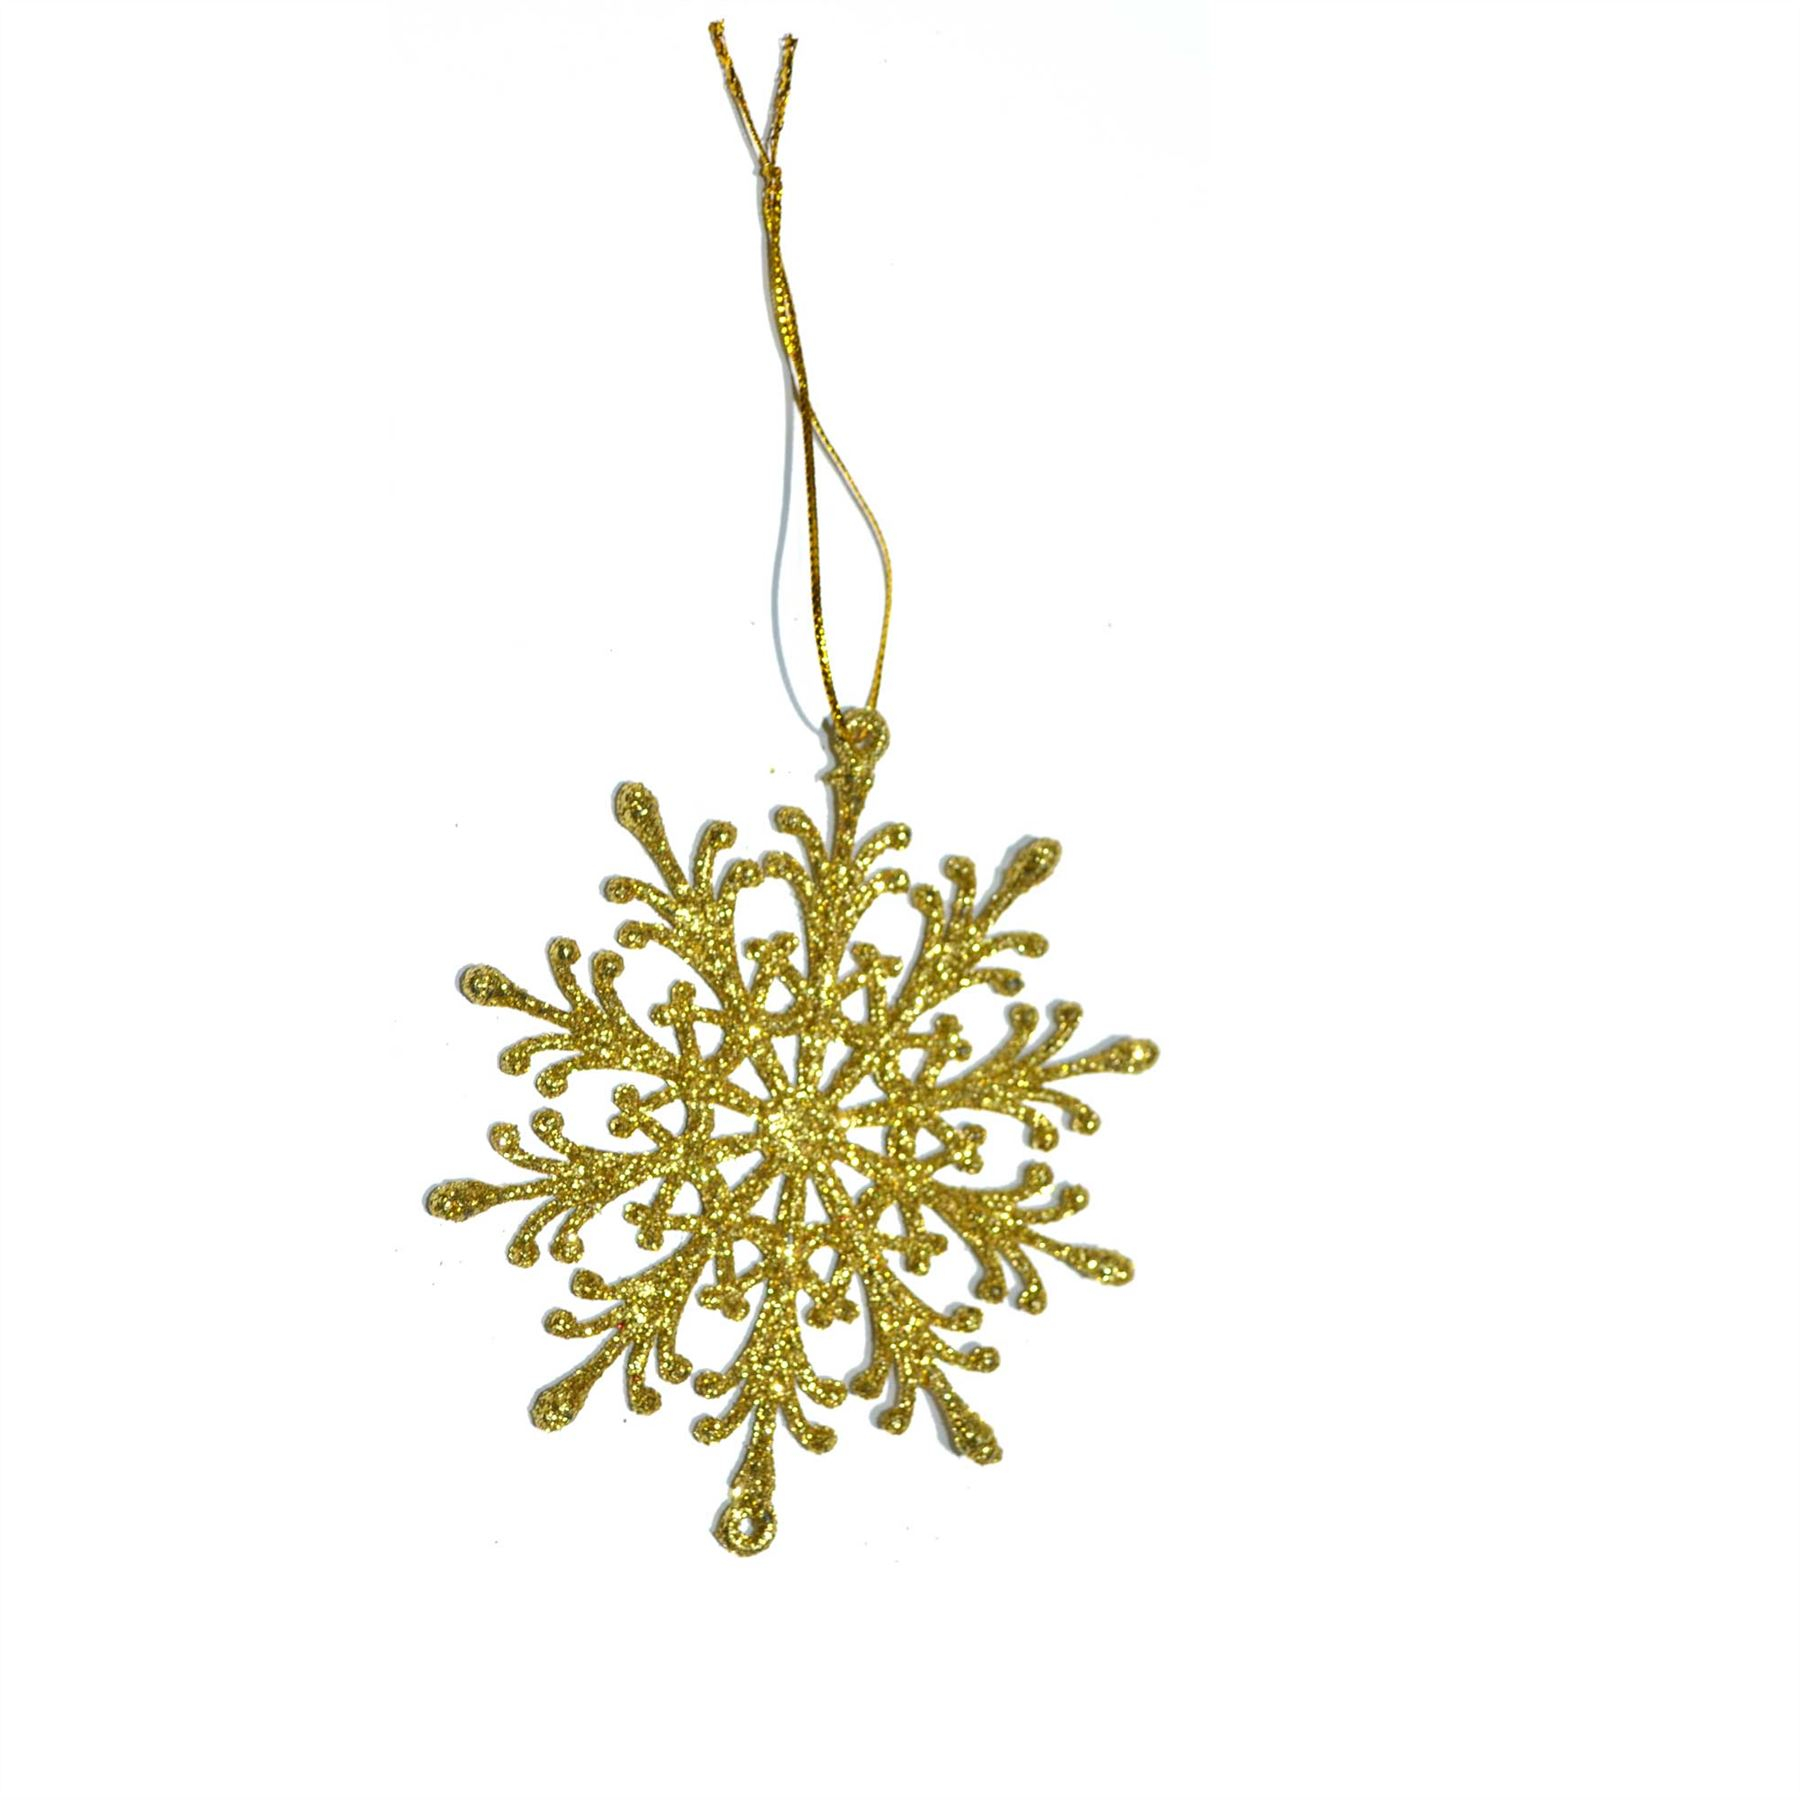 Christmas-Tree-Hanging-Decorations-Glitter-Snowman-Xmas-Beads-Chain-Garland thumbnail 9